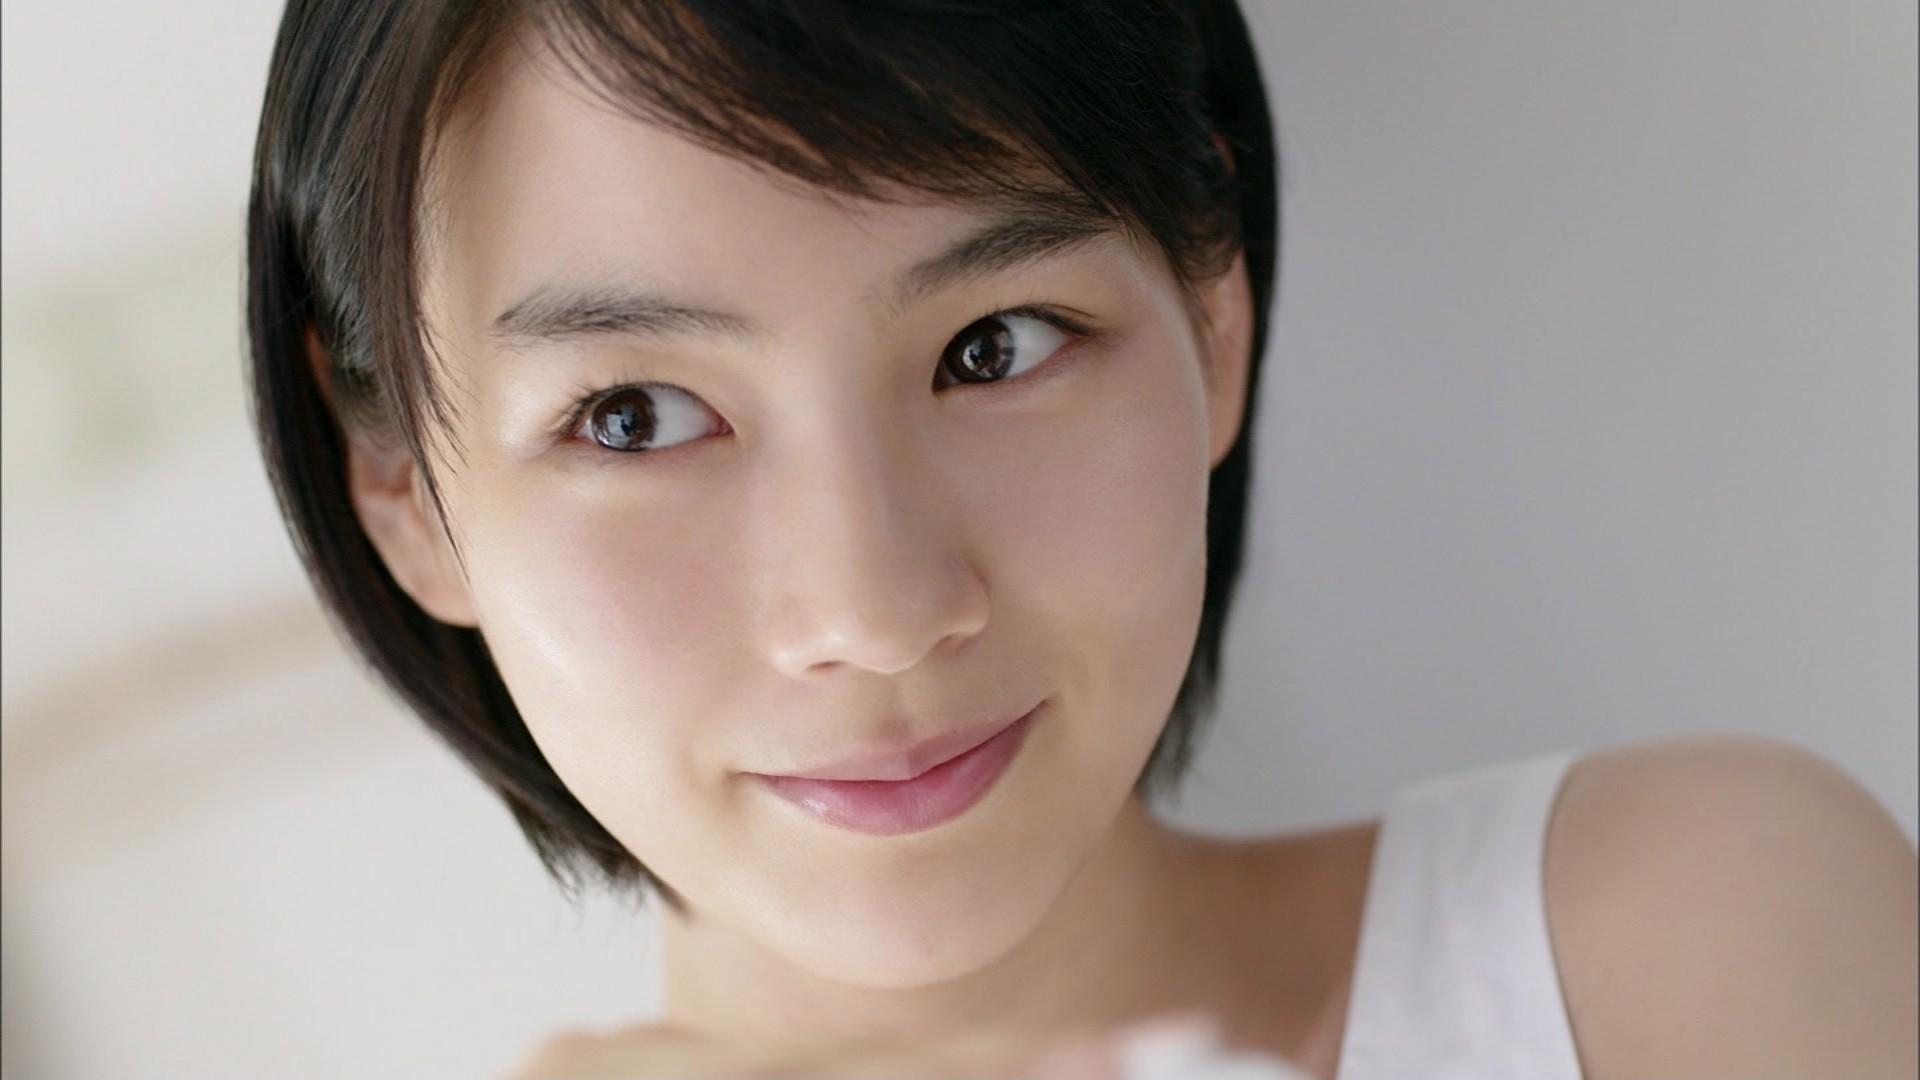 http://livedoor.blogimg.jp/konnnatv/imgs/9/b/9bd25e39.jpg